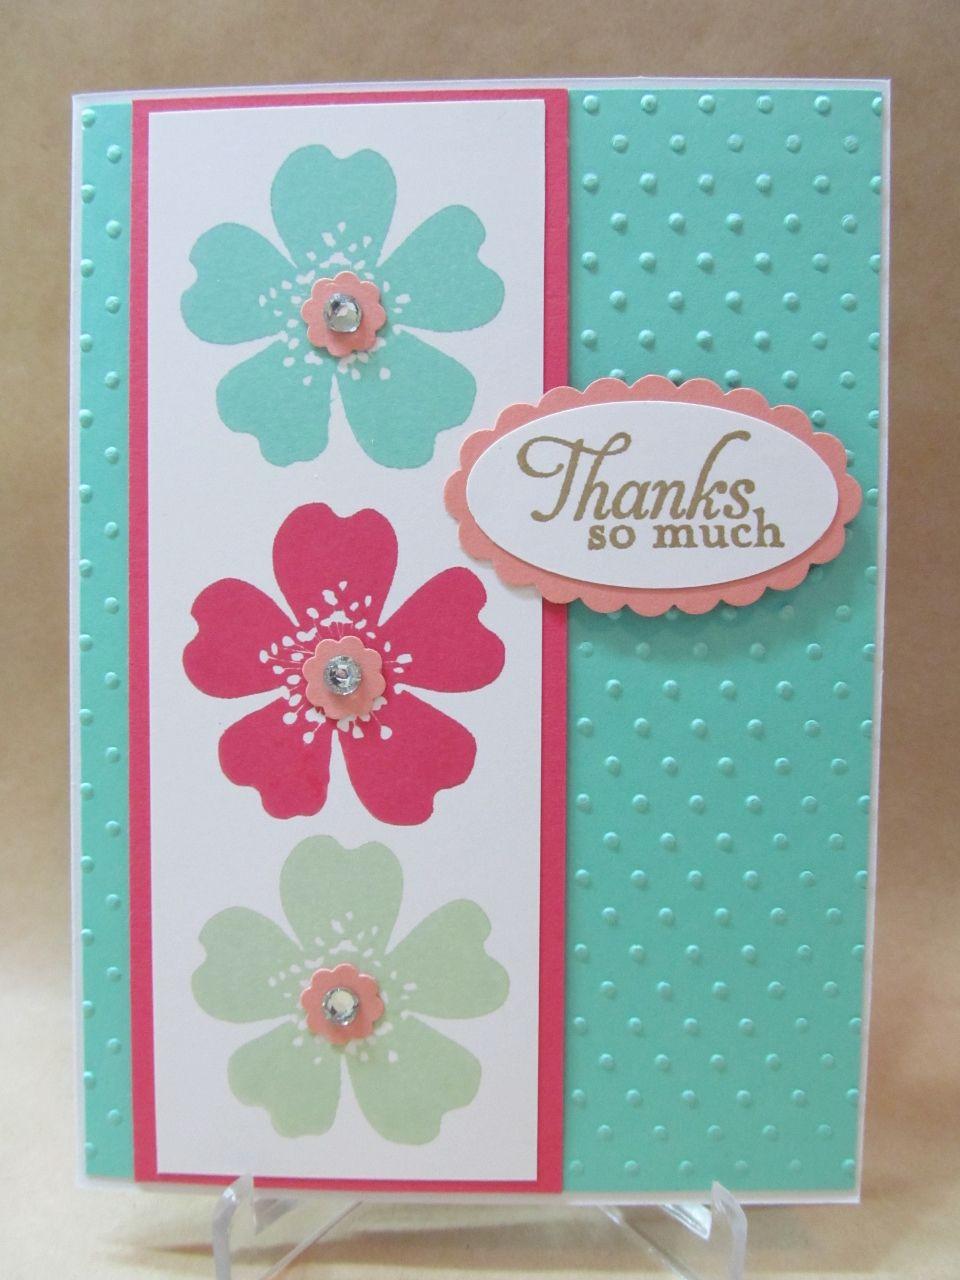 Birthday invitation savvy handmade cards stampin up 20132015 in birthday invitation savvy handmade cards stampin up 20132015 in stopboris Image collections